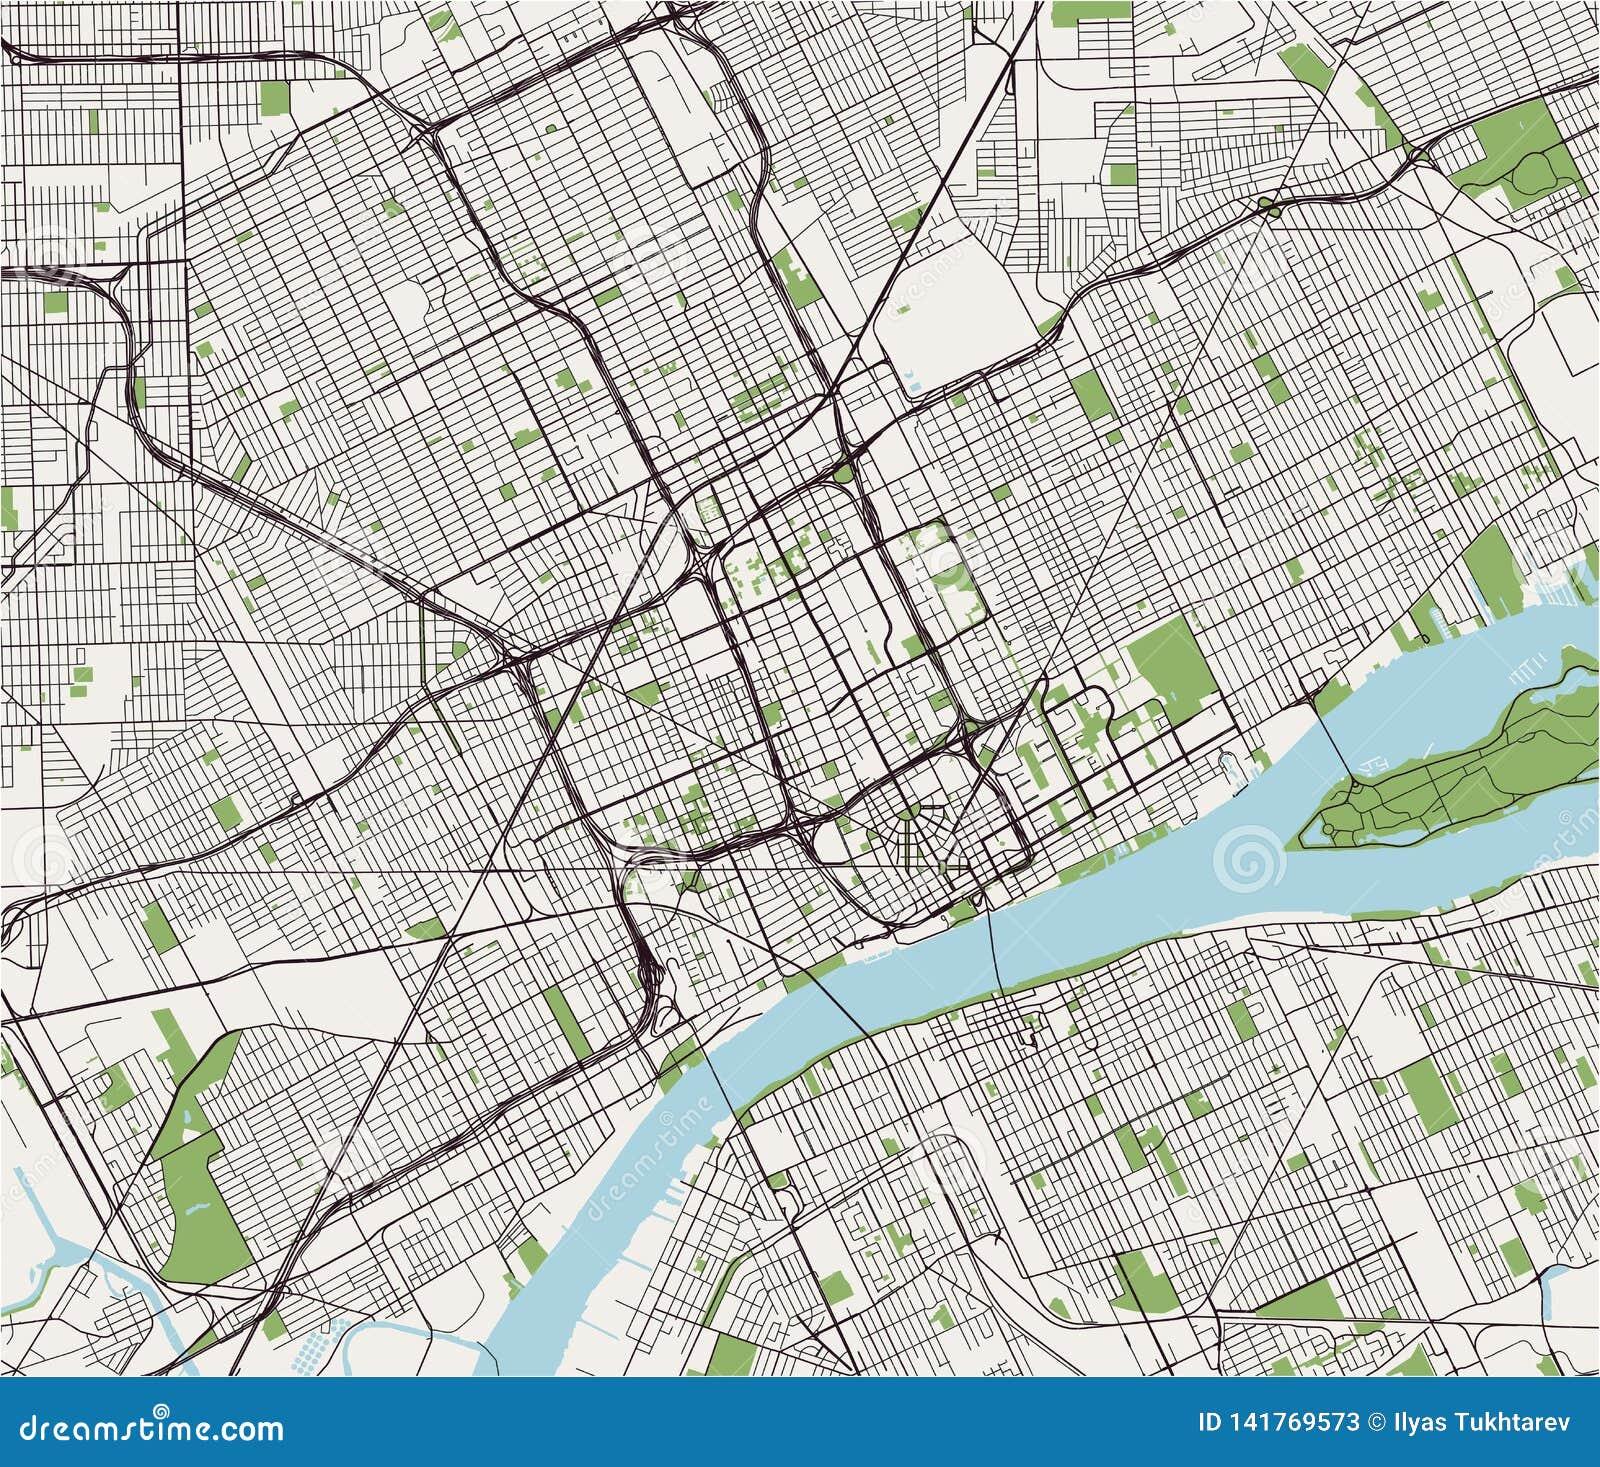 mapa da cidade de detroit michigan eua ilustracao stock ilustracao de area cidade 141769573 https pt dreamstime com mapa da cidade de detroit michigan eua do vetor image141769573